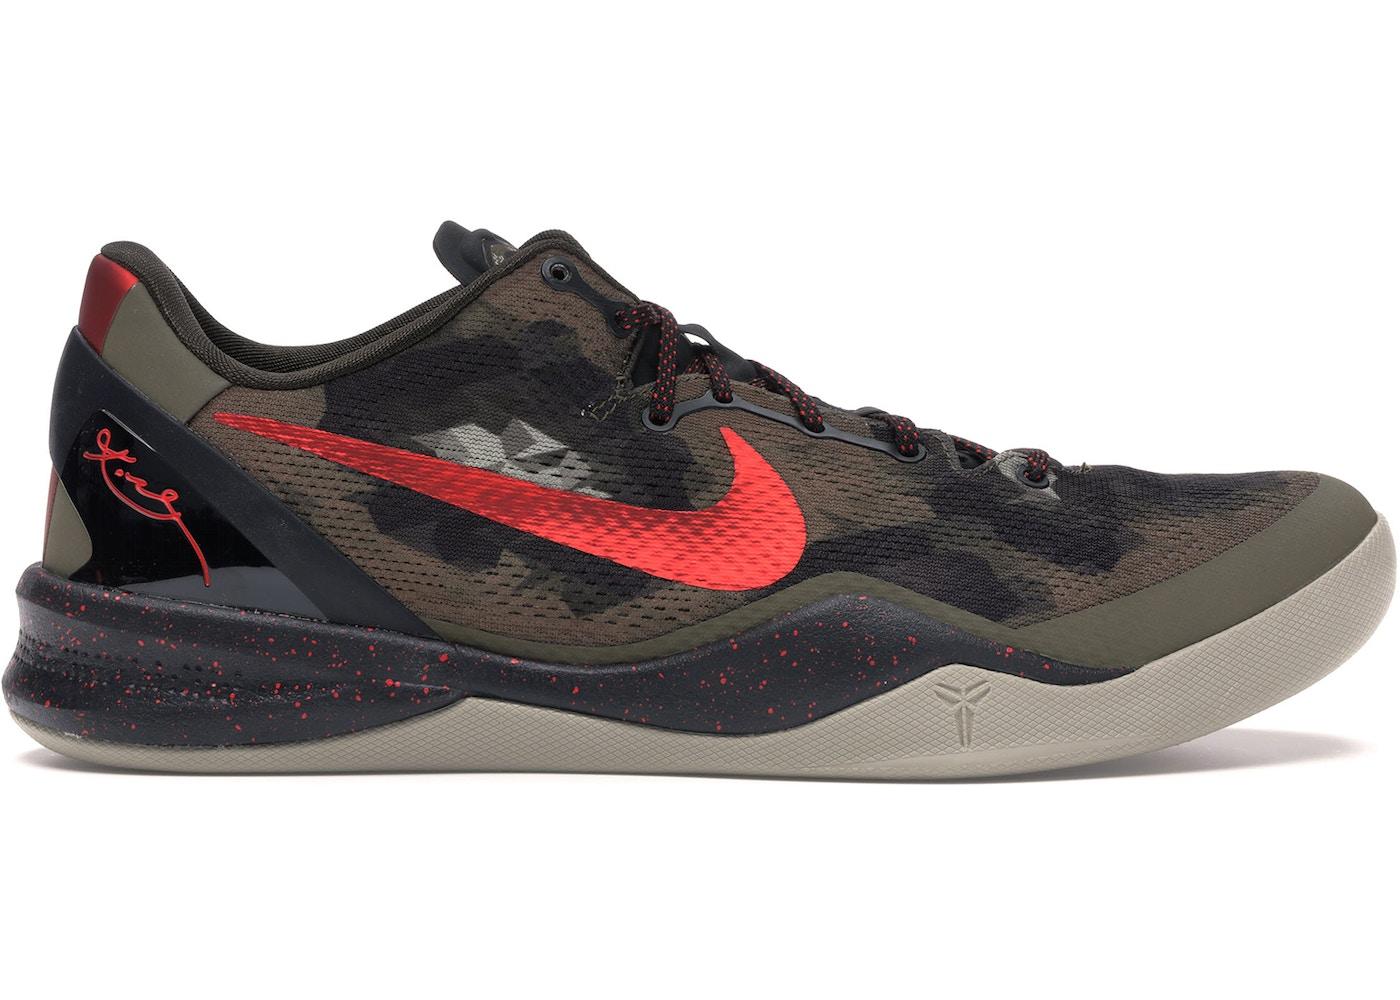 online retailer 625f5 4cd4c Buy Nike Kobe 8 Shoes & Deadstock Sneakers